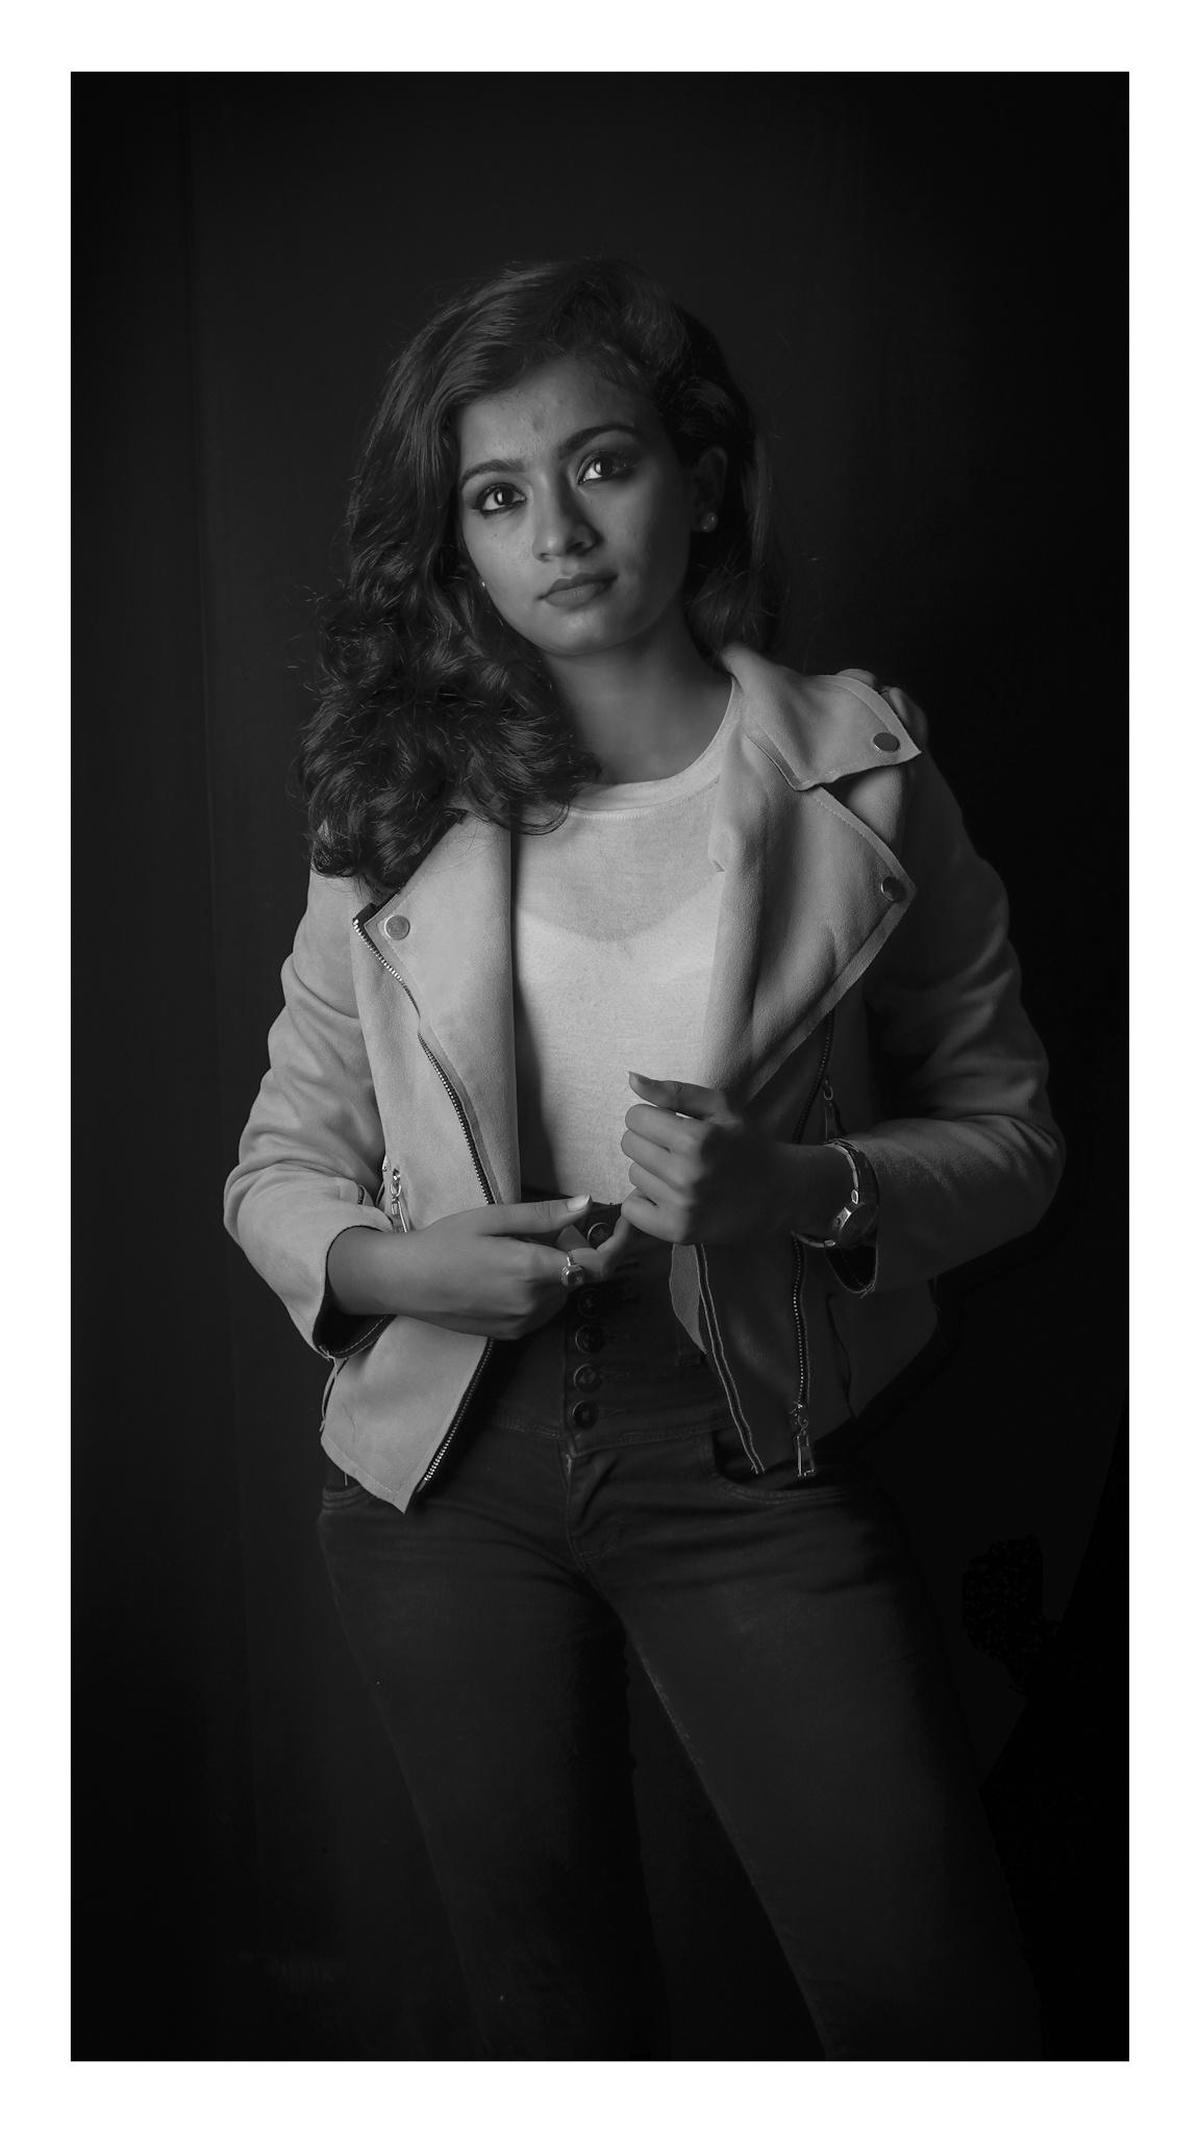 Image of Photograph, Black, White, Black-and-white, Beauty, Photo shoot etc.